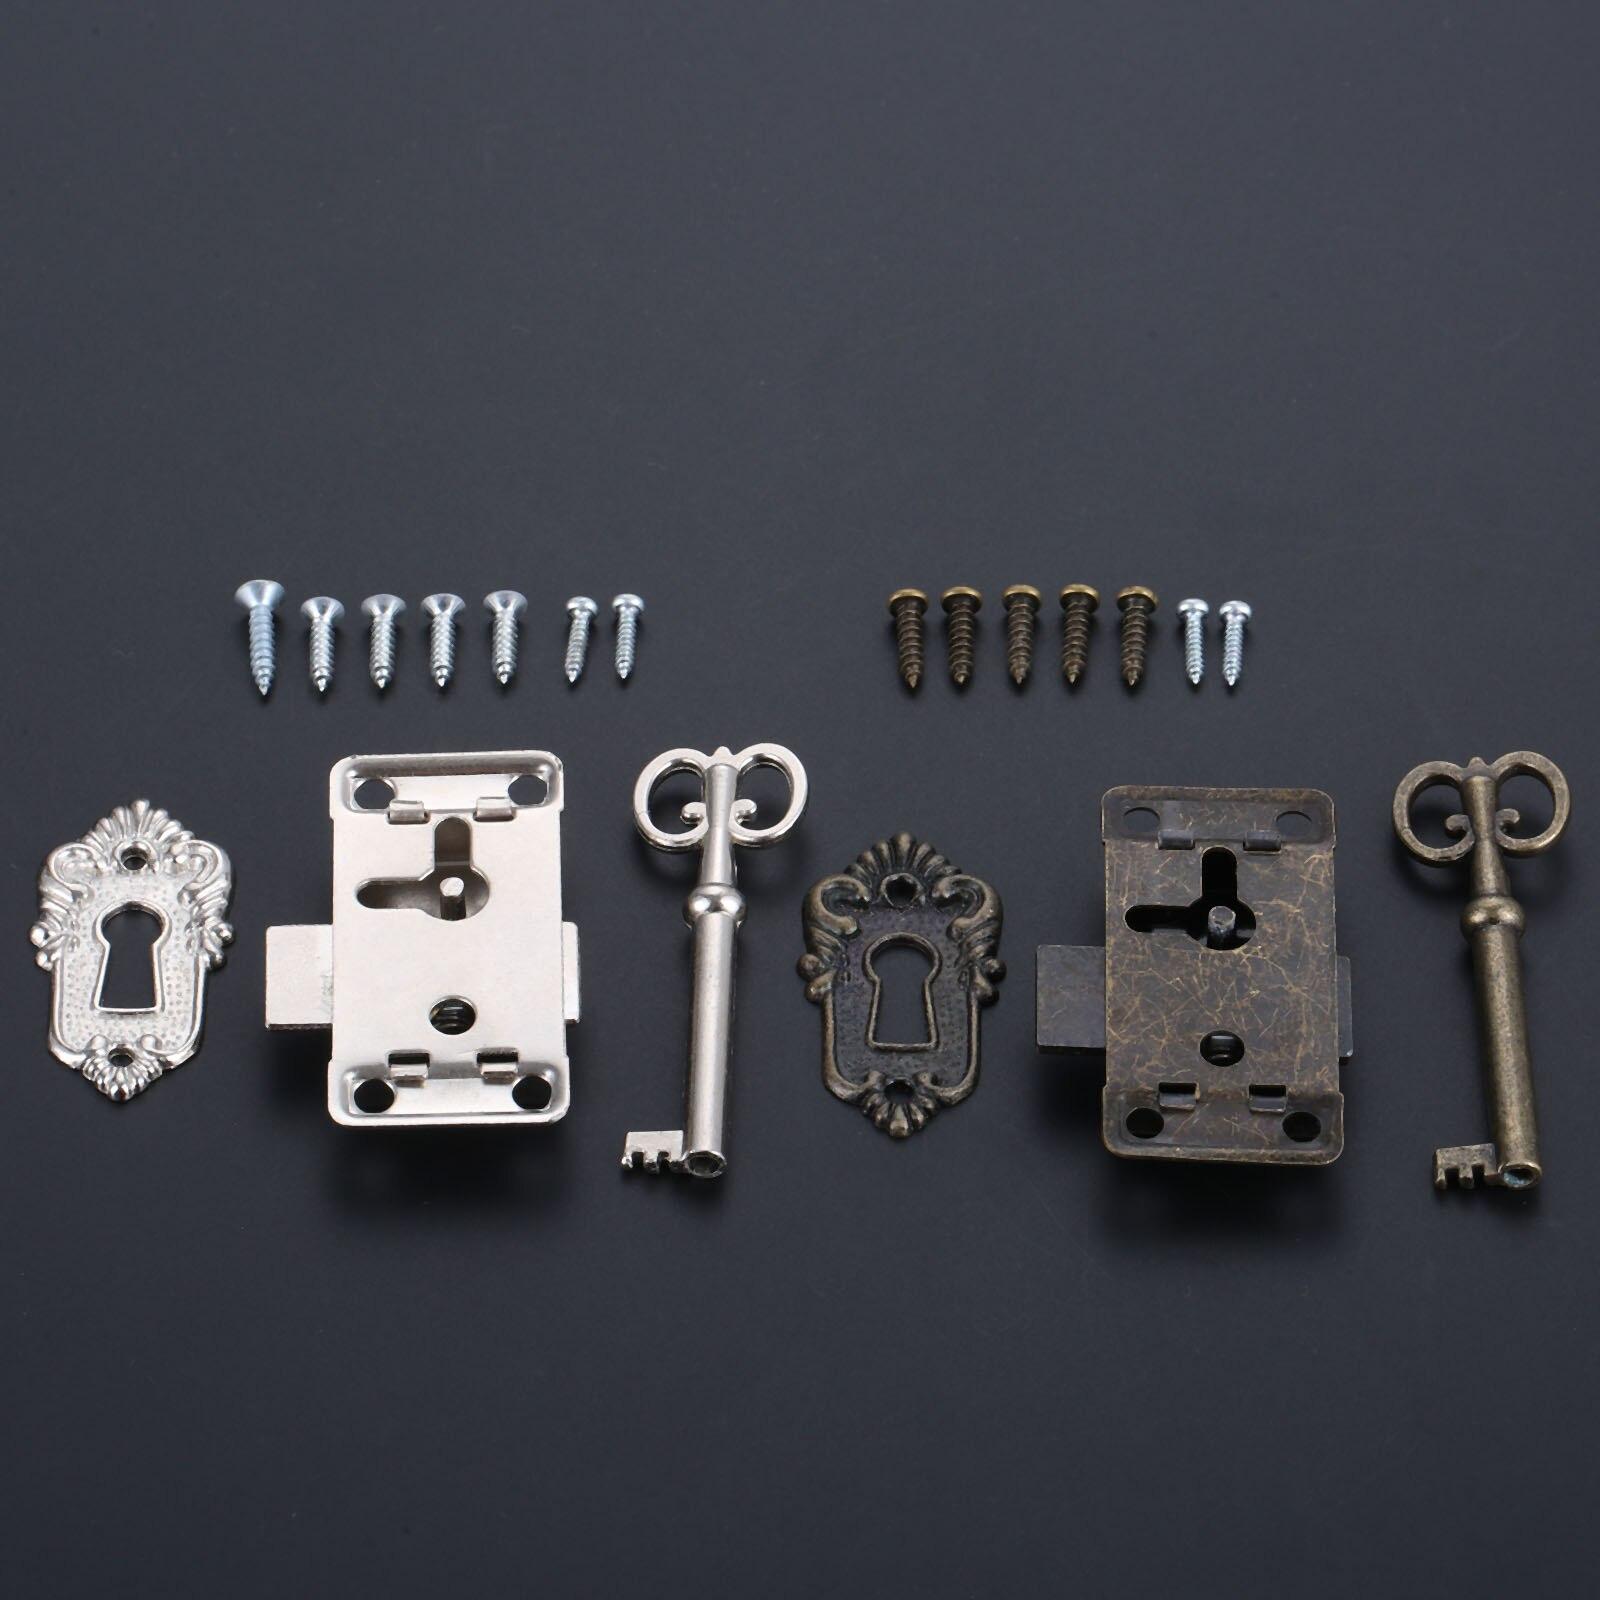 DRELD Antique Iron Door Lock Drawer Jewelry Wood Box Cabinet Wardrobe Cupboard Door Lock + Key Furniture Hardware Silver/Black